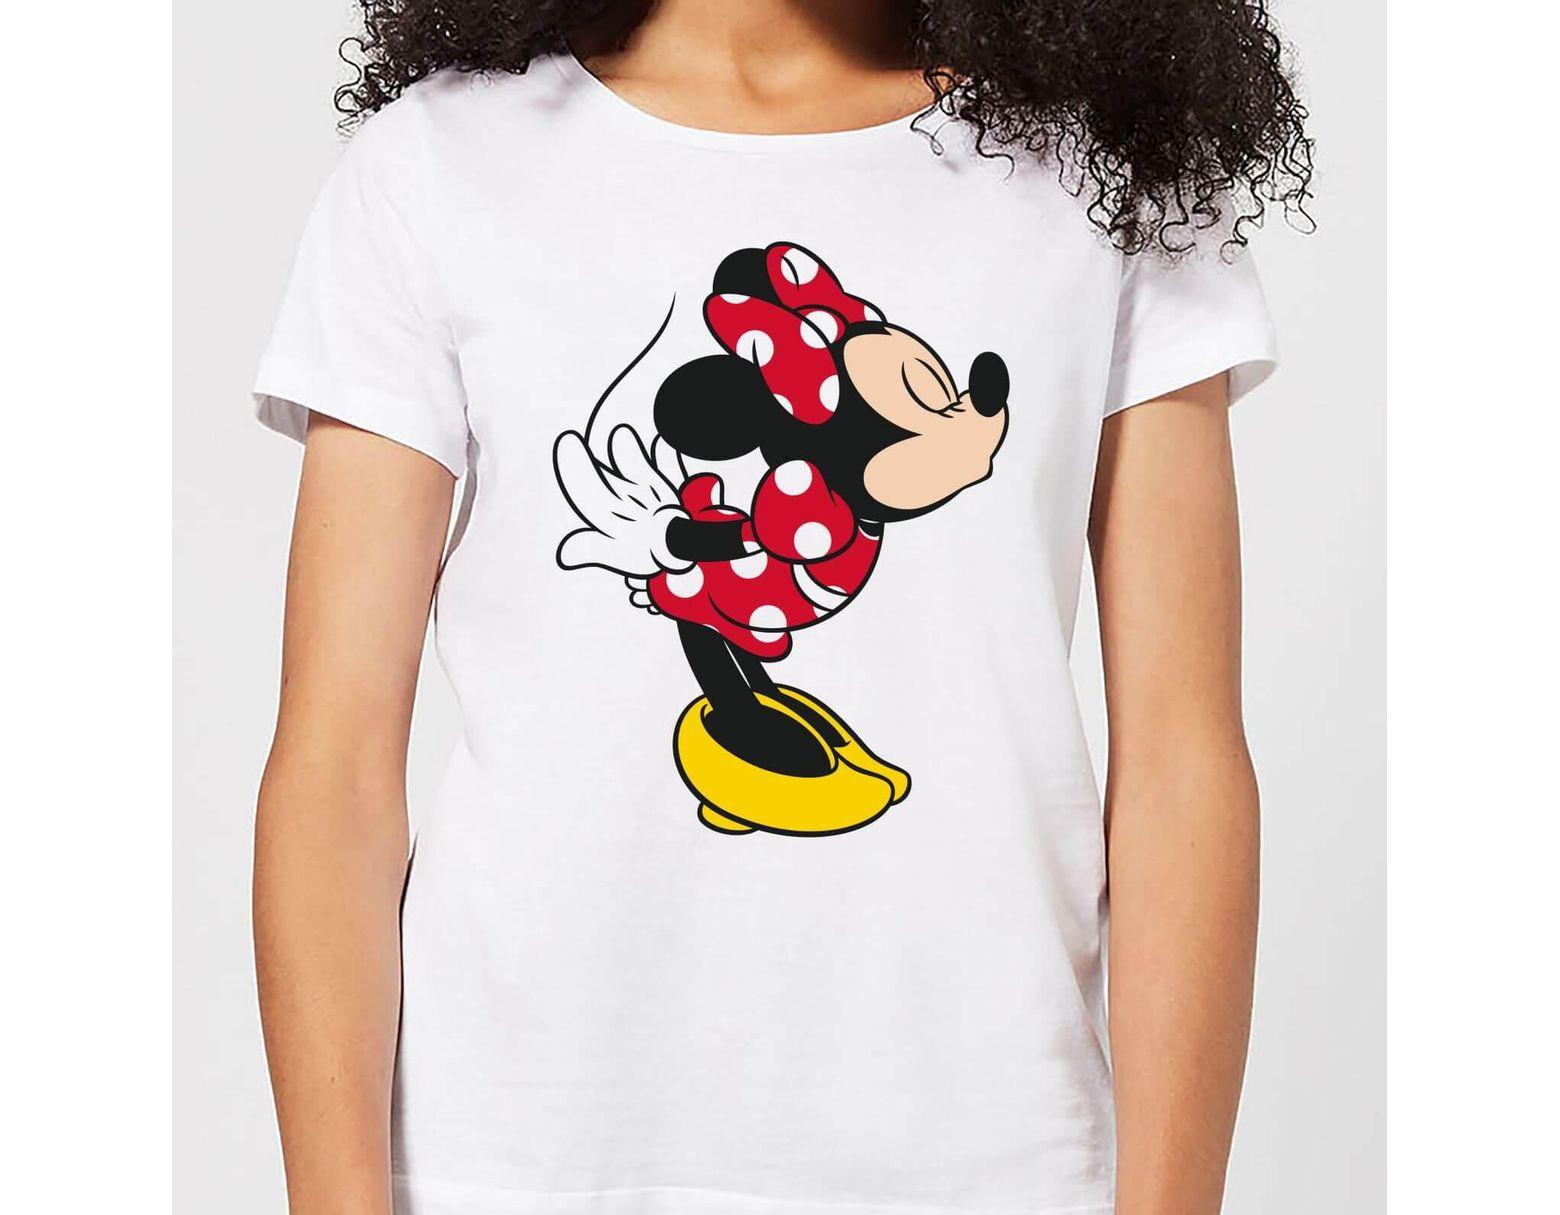 cf7ac939d Disney Mickey Mouse Minnie Split Kiss T-shirt in White - Lyst